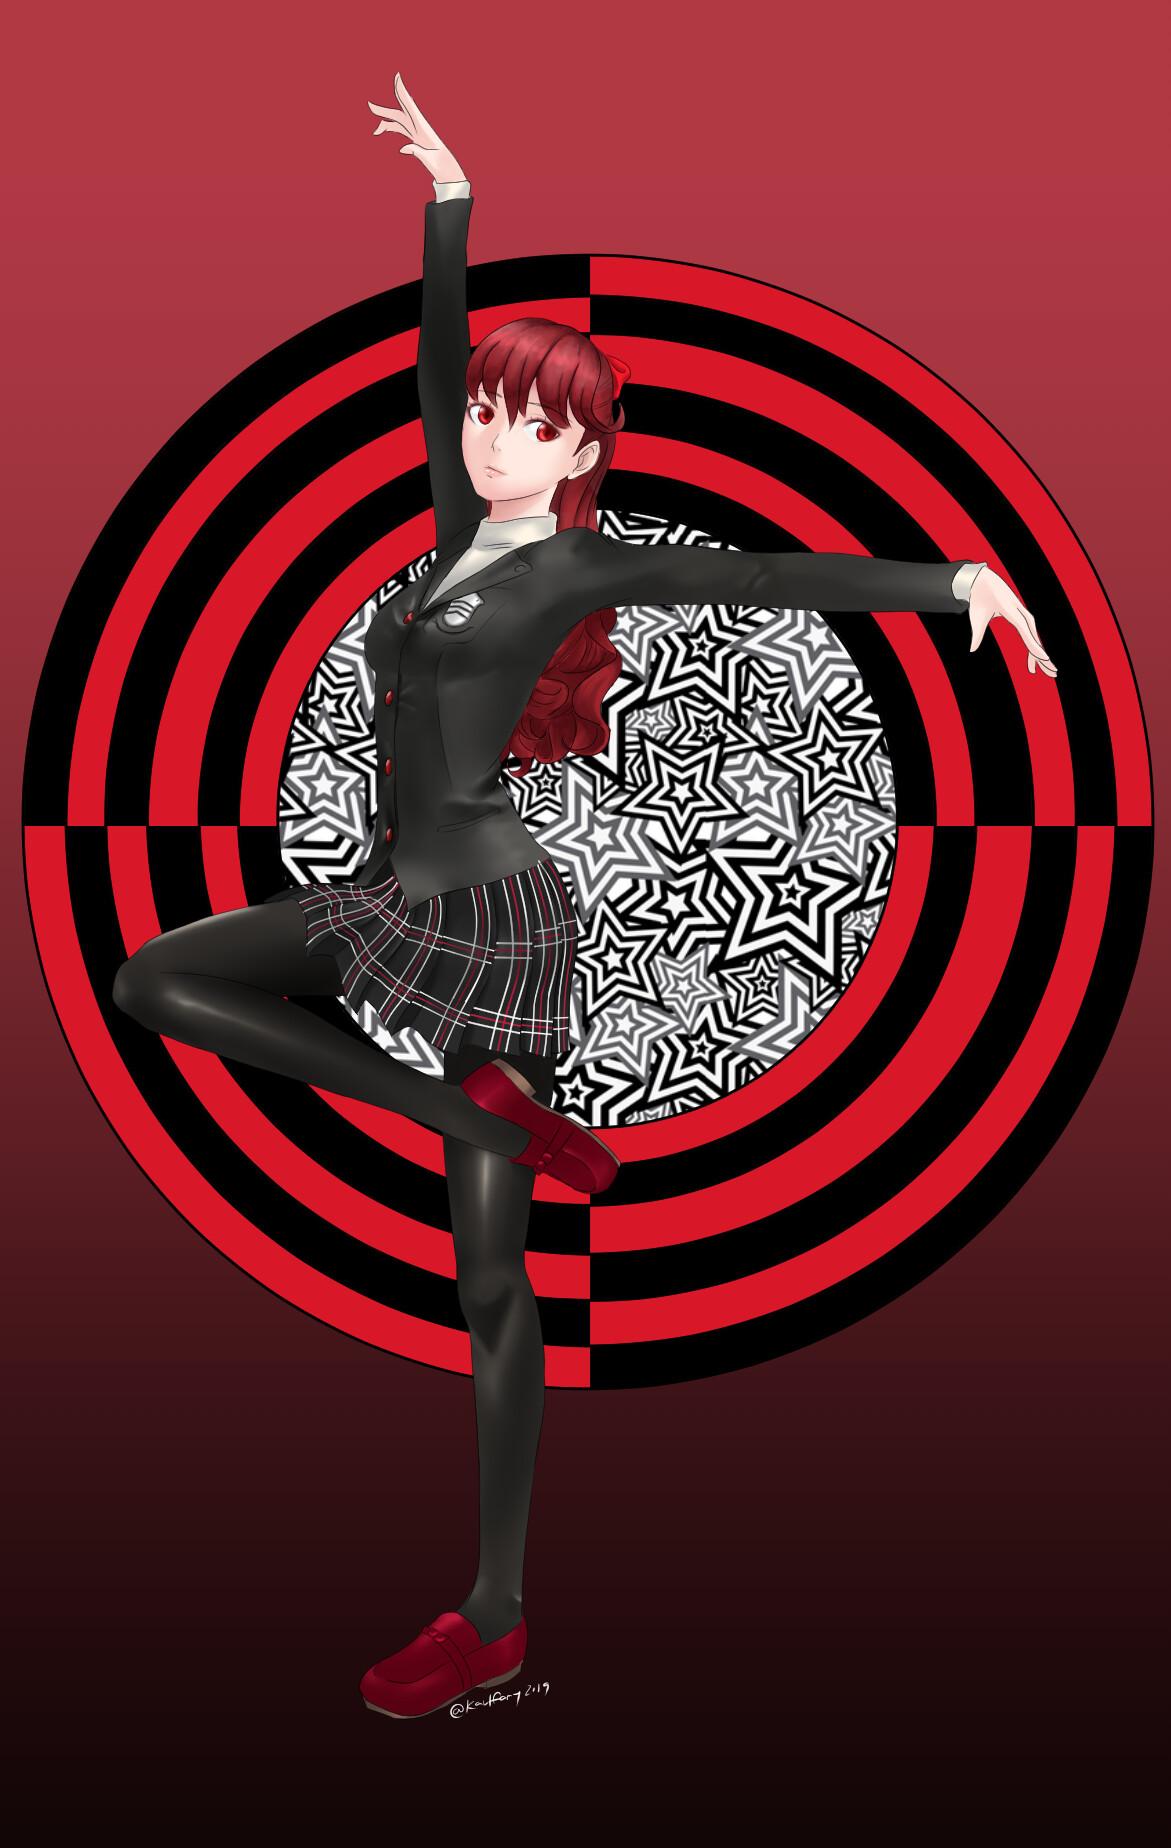 ArtStation - Persona 5 the royal Fanart - Kasumi, Karl Famy